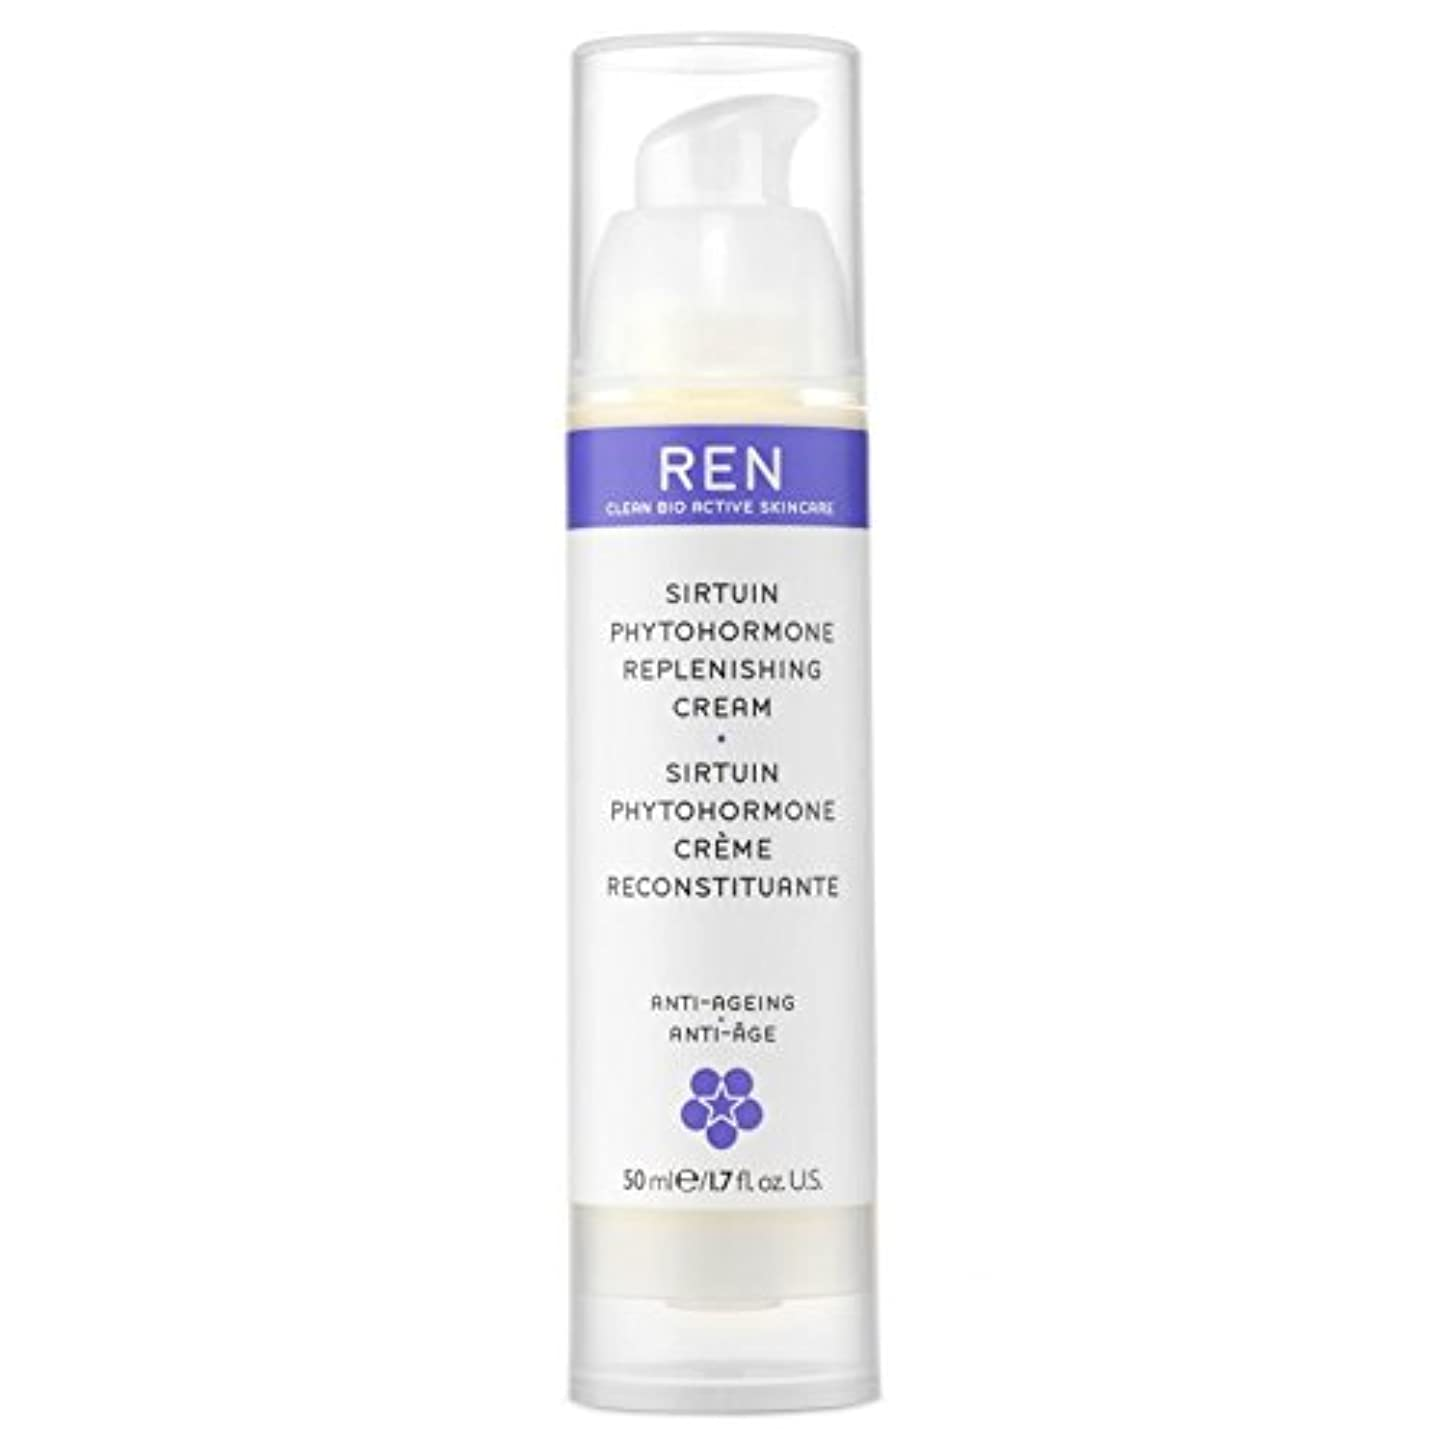 REN Sirtuin Phytohormone Replenishing Cream - サーチュイン植物ホルモン補充クリーム [並行輸入品]